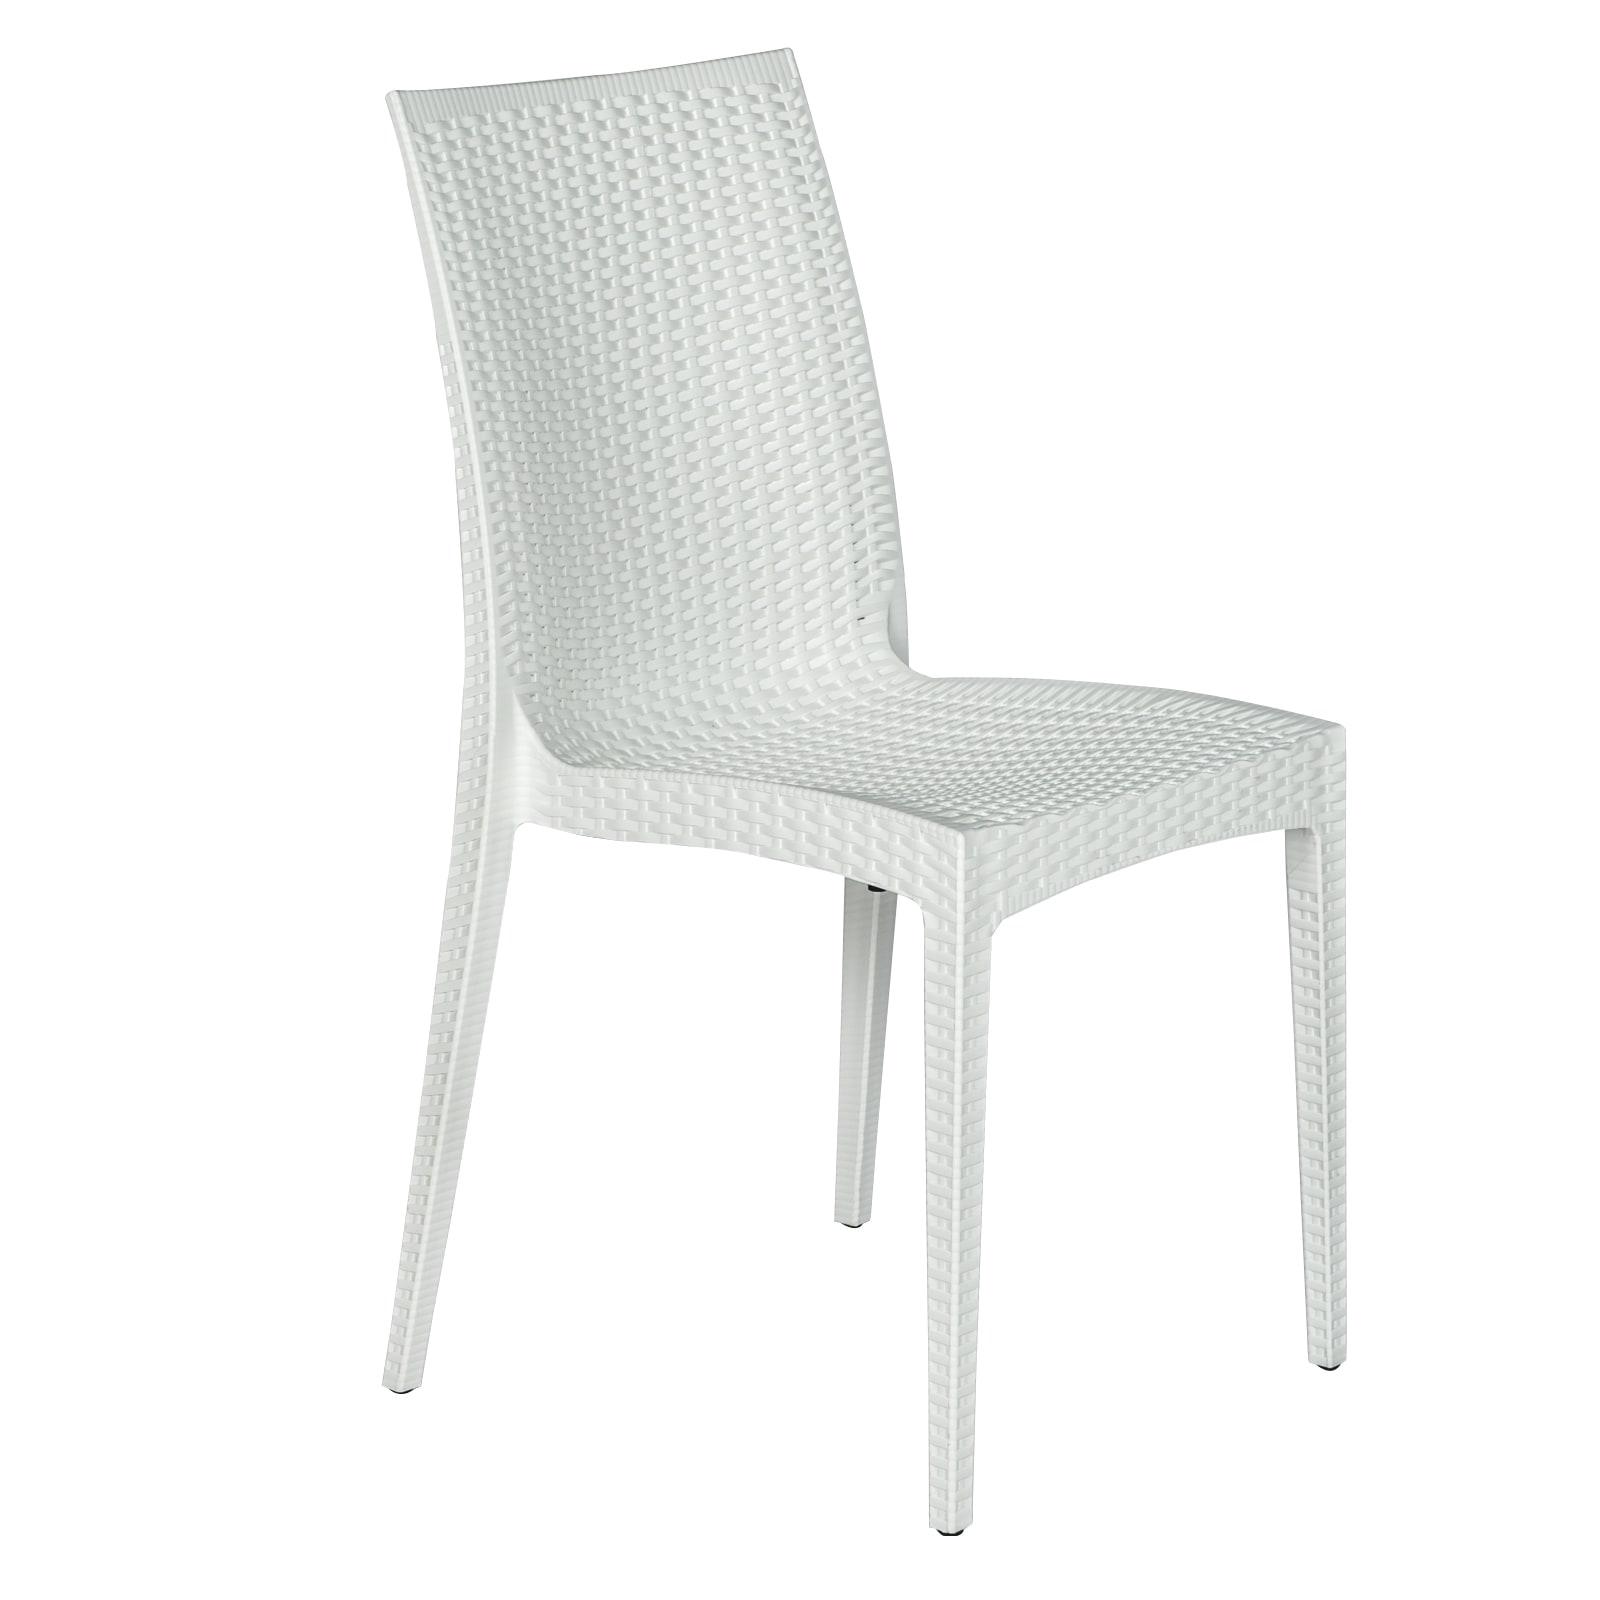 LeisureMod Mace Modern Weave White Indoor/ Outdoor Dining...